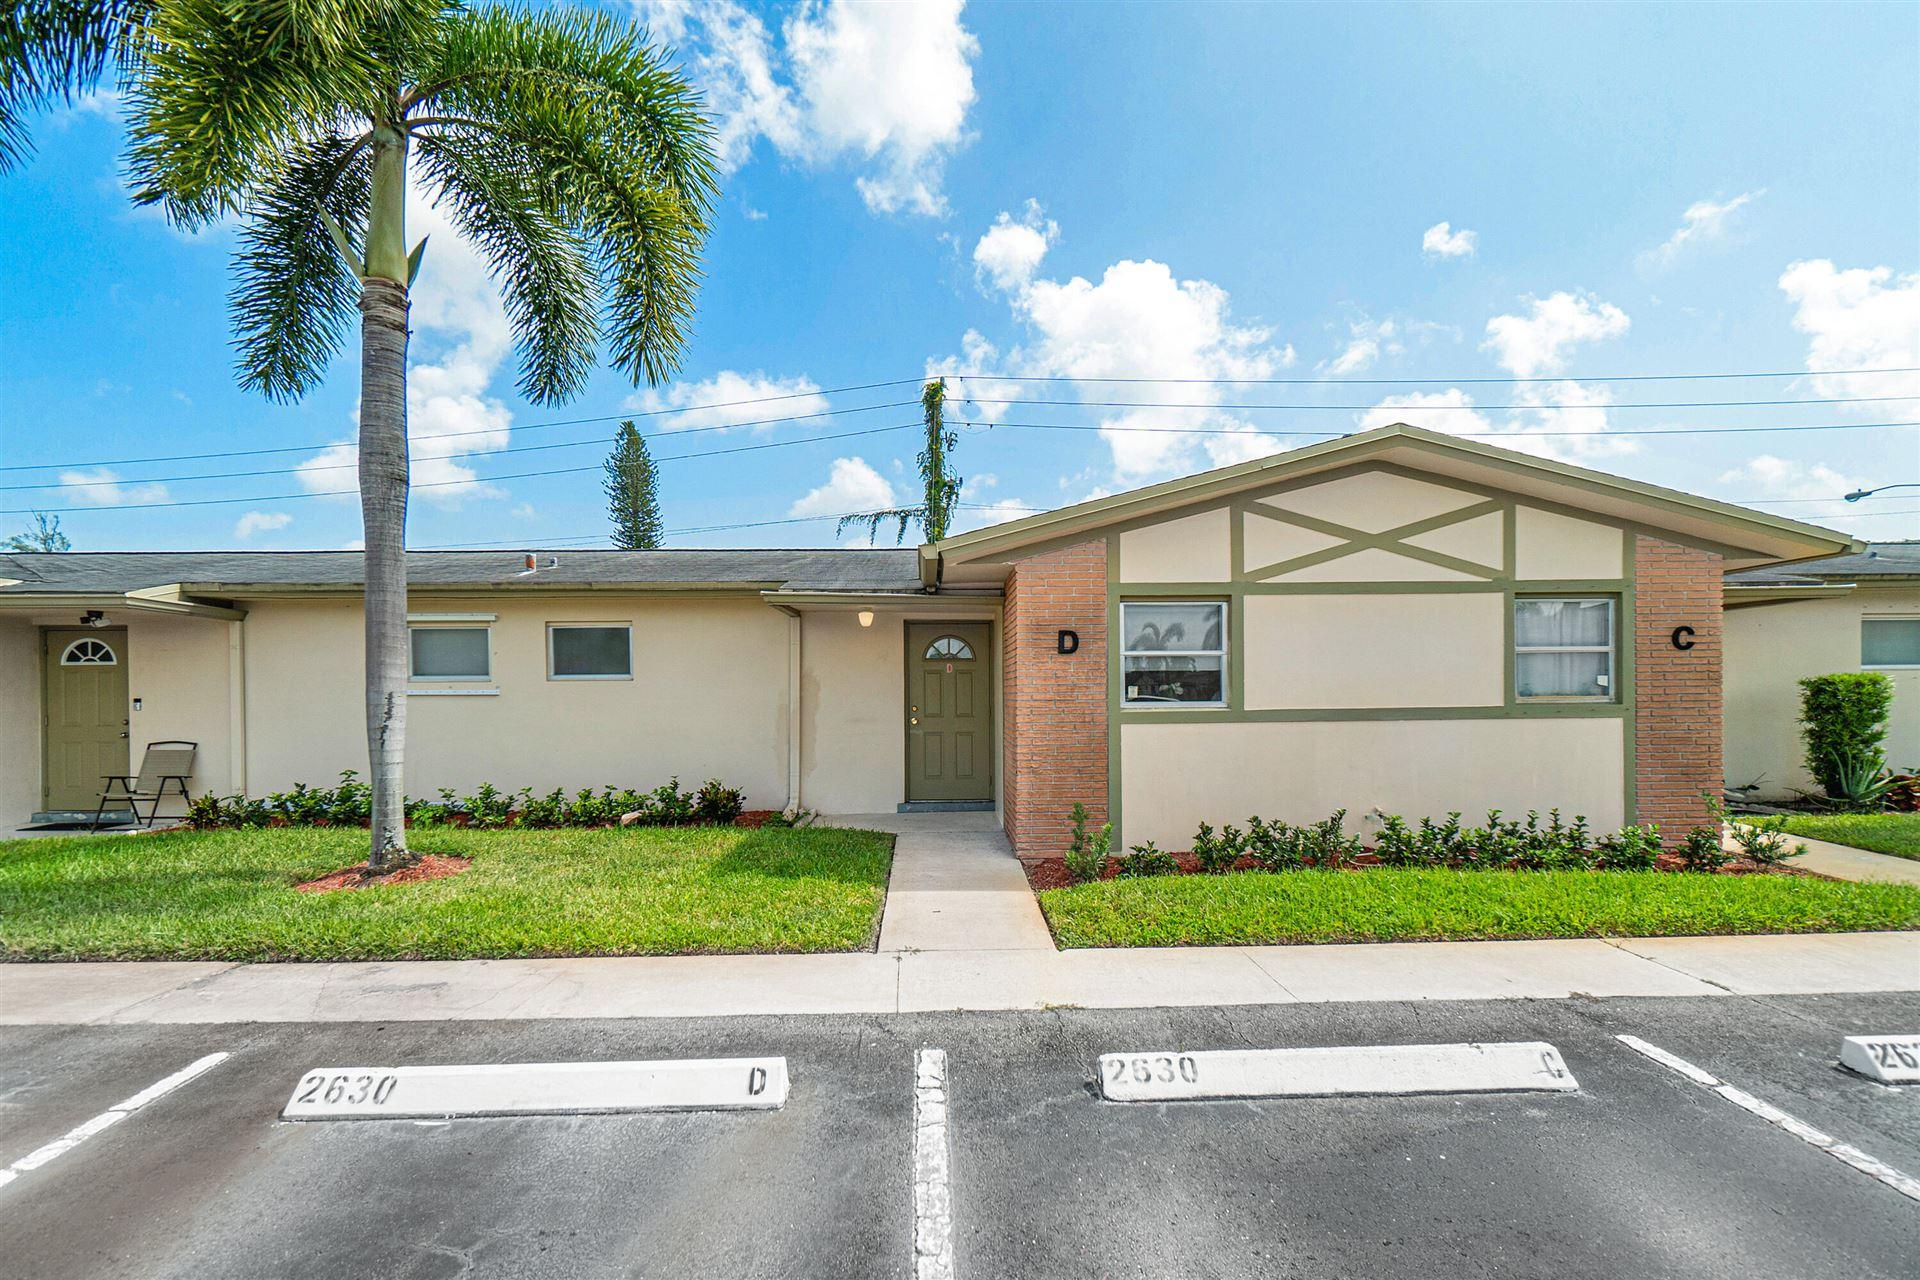 2630 Barkley Drive E #D, West Palm Beach, FL 33415 - #: RX-10750900